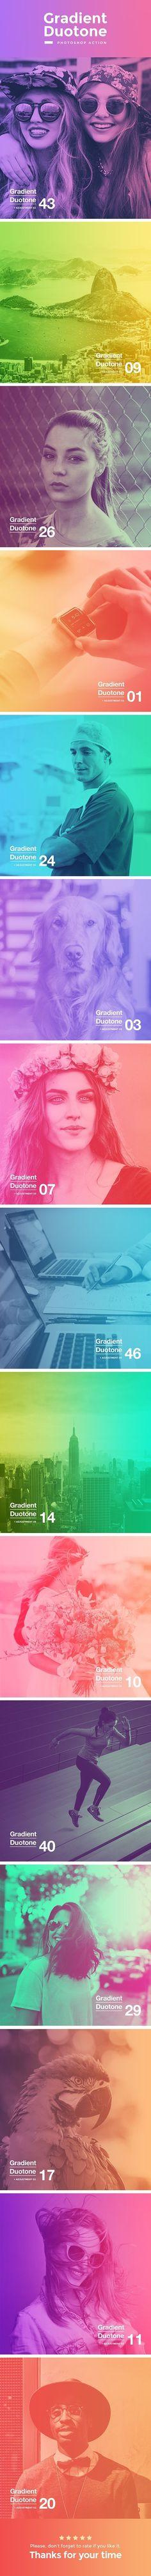 Gradient Duotone Photoshop Action — Photoshop ATN #startup #photoshop • Download ➝ https://graphicriver.net/item/gradient-duotone-photoshop-action/19484088?ref=pxcr